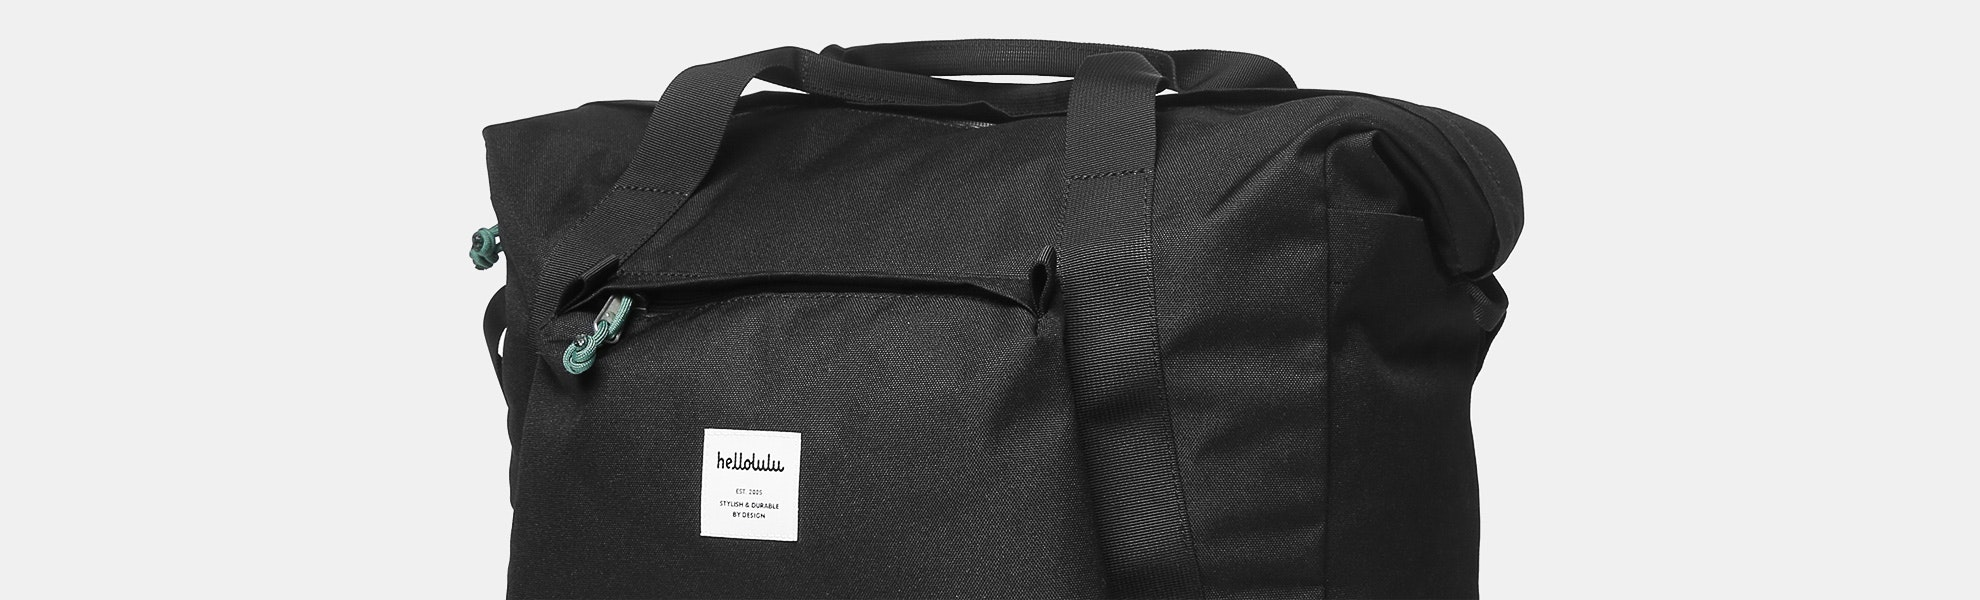 Hellolulu Tobin Duffel Bag